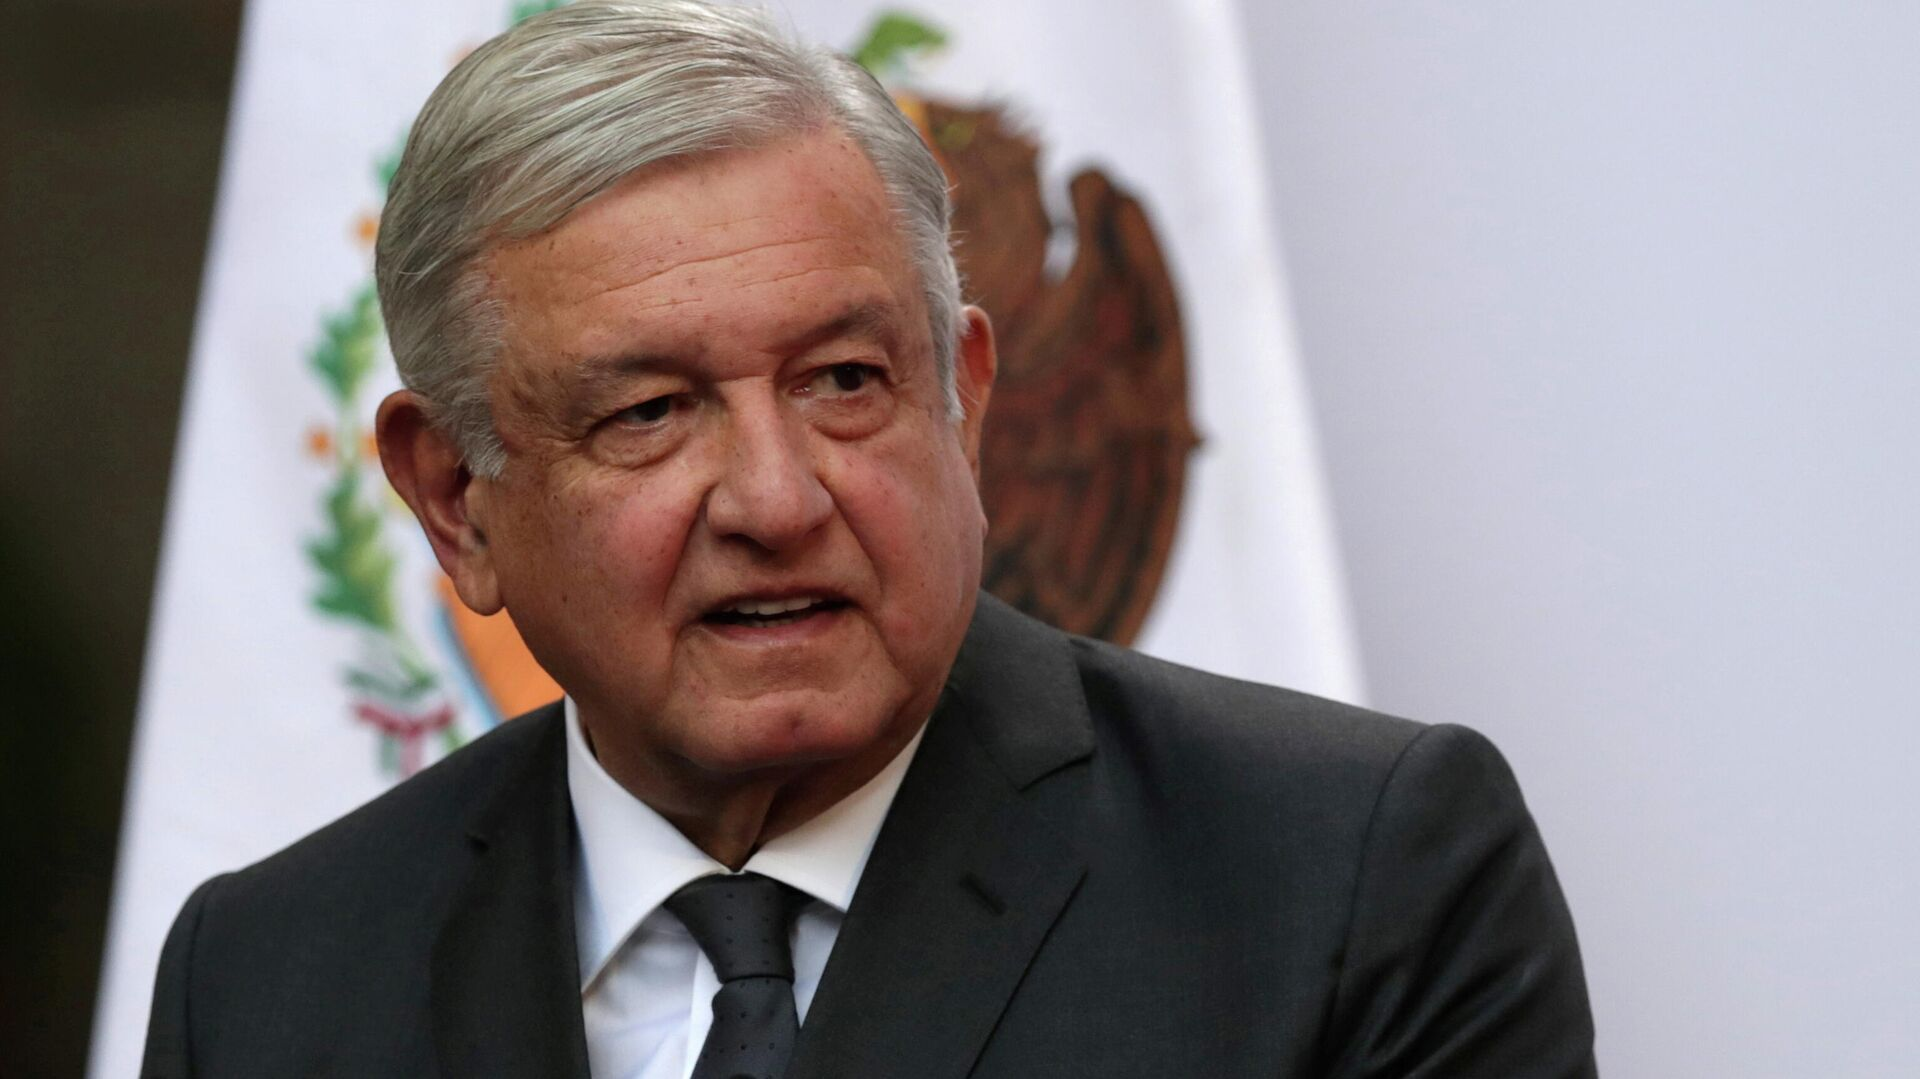 El presidente de México, Andrés Manuel López Obrador - Sputnik Mundo, 1920, 31.03.2021